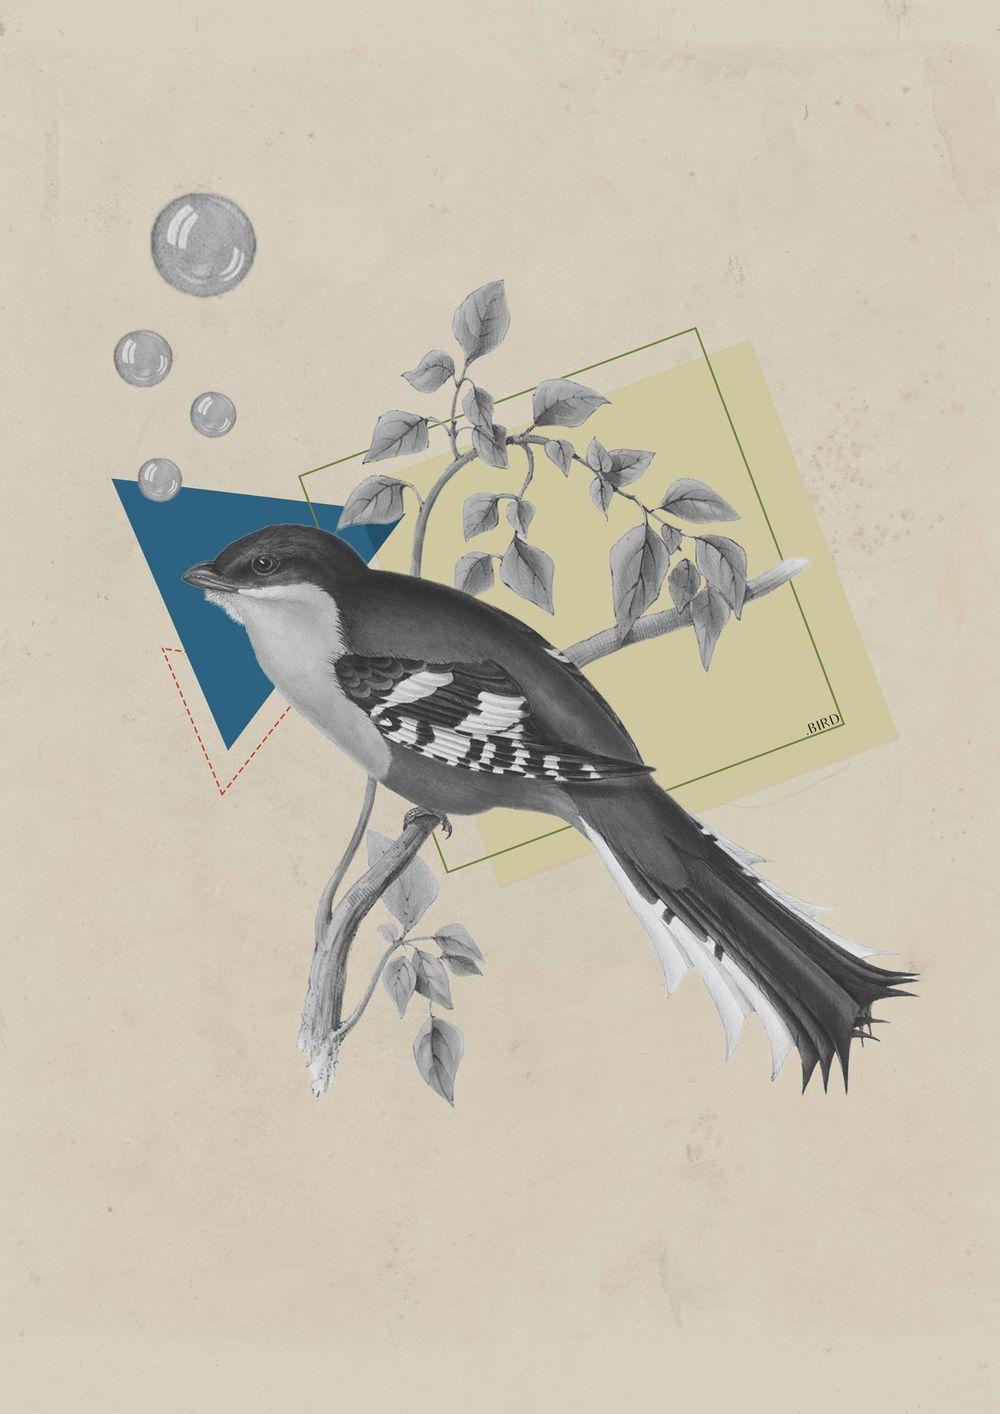 Vintage bird - image 3 - student project